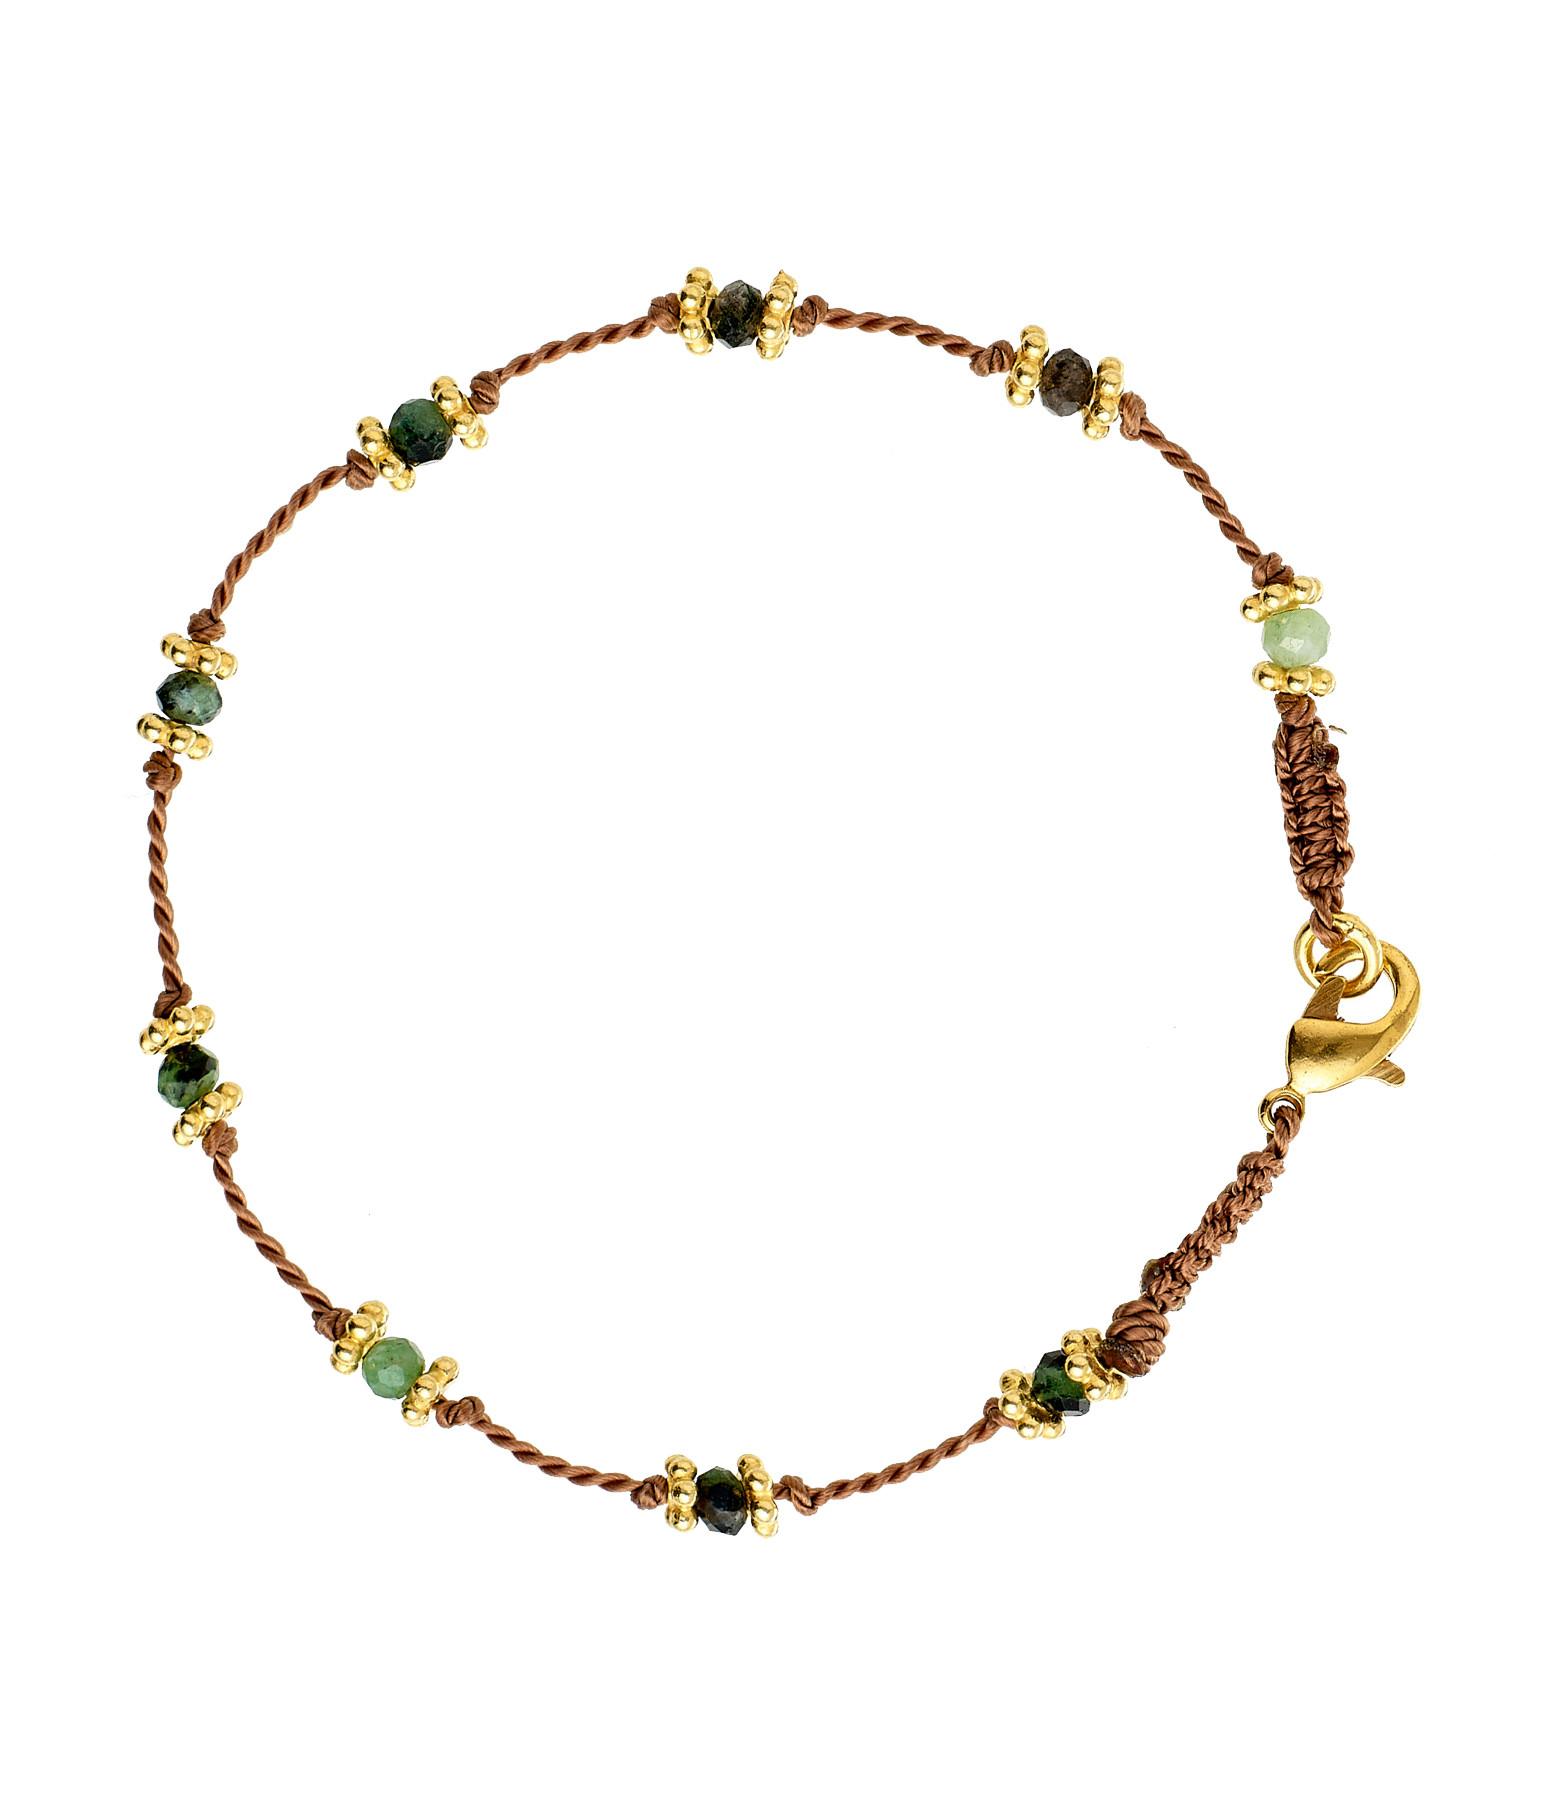 TITYARAVY - Bracelet Lotus Beige Rubisoizite Plaqué Or